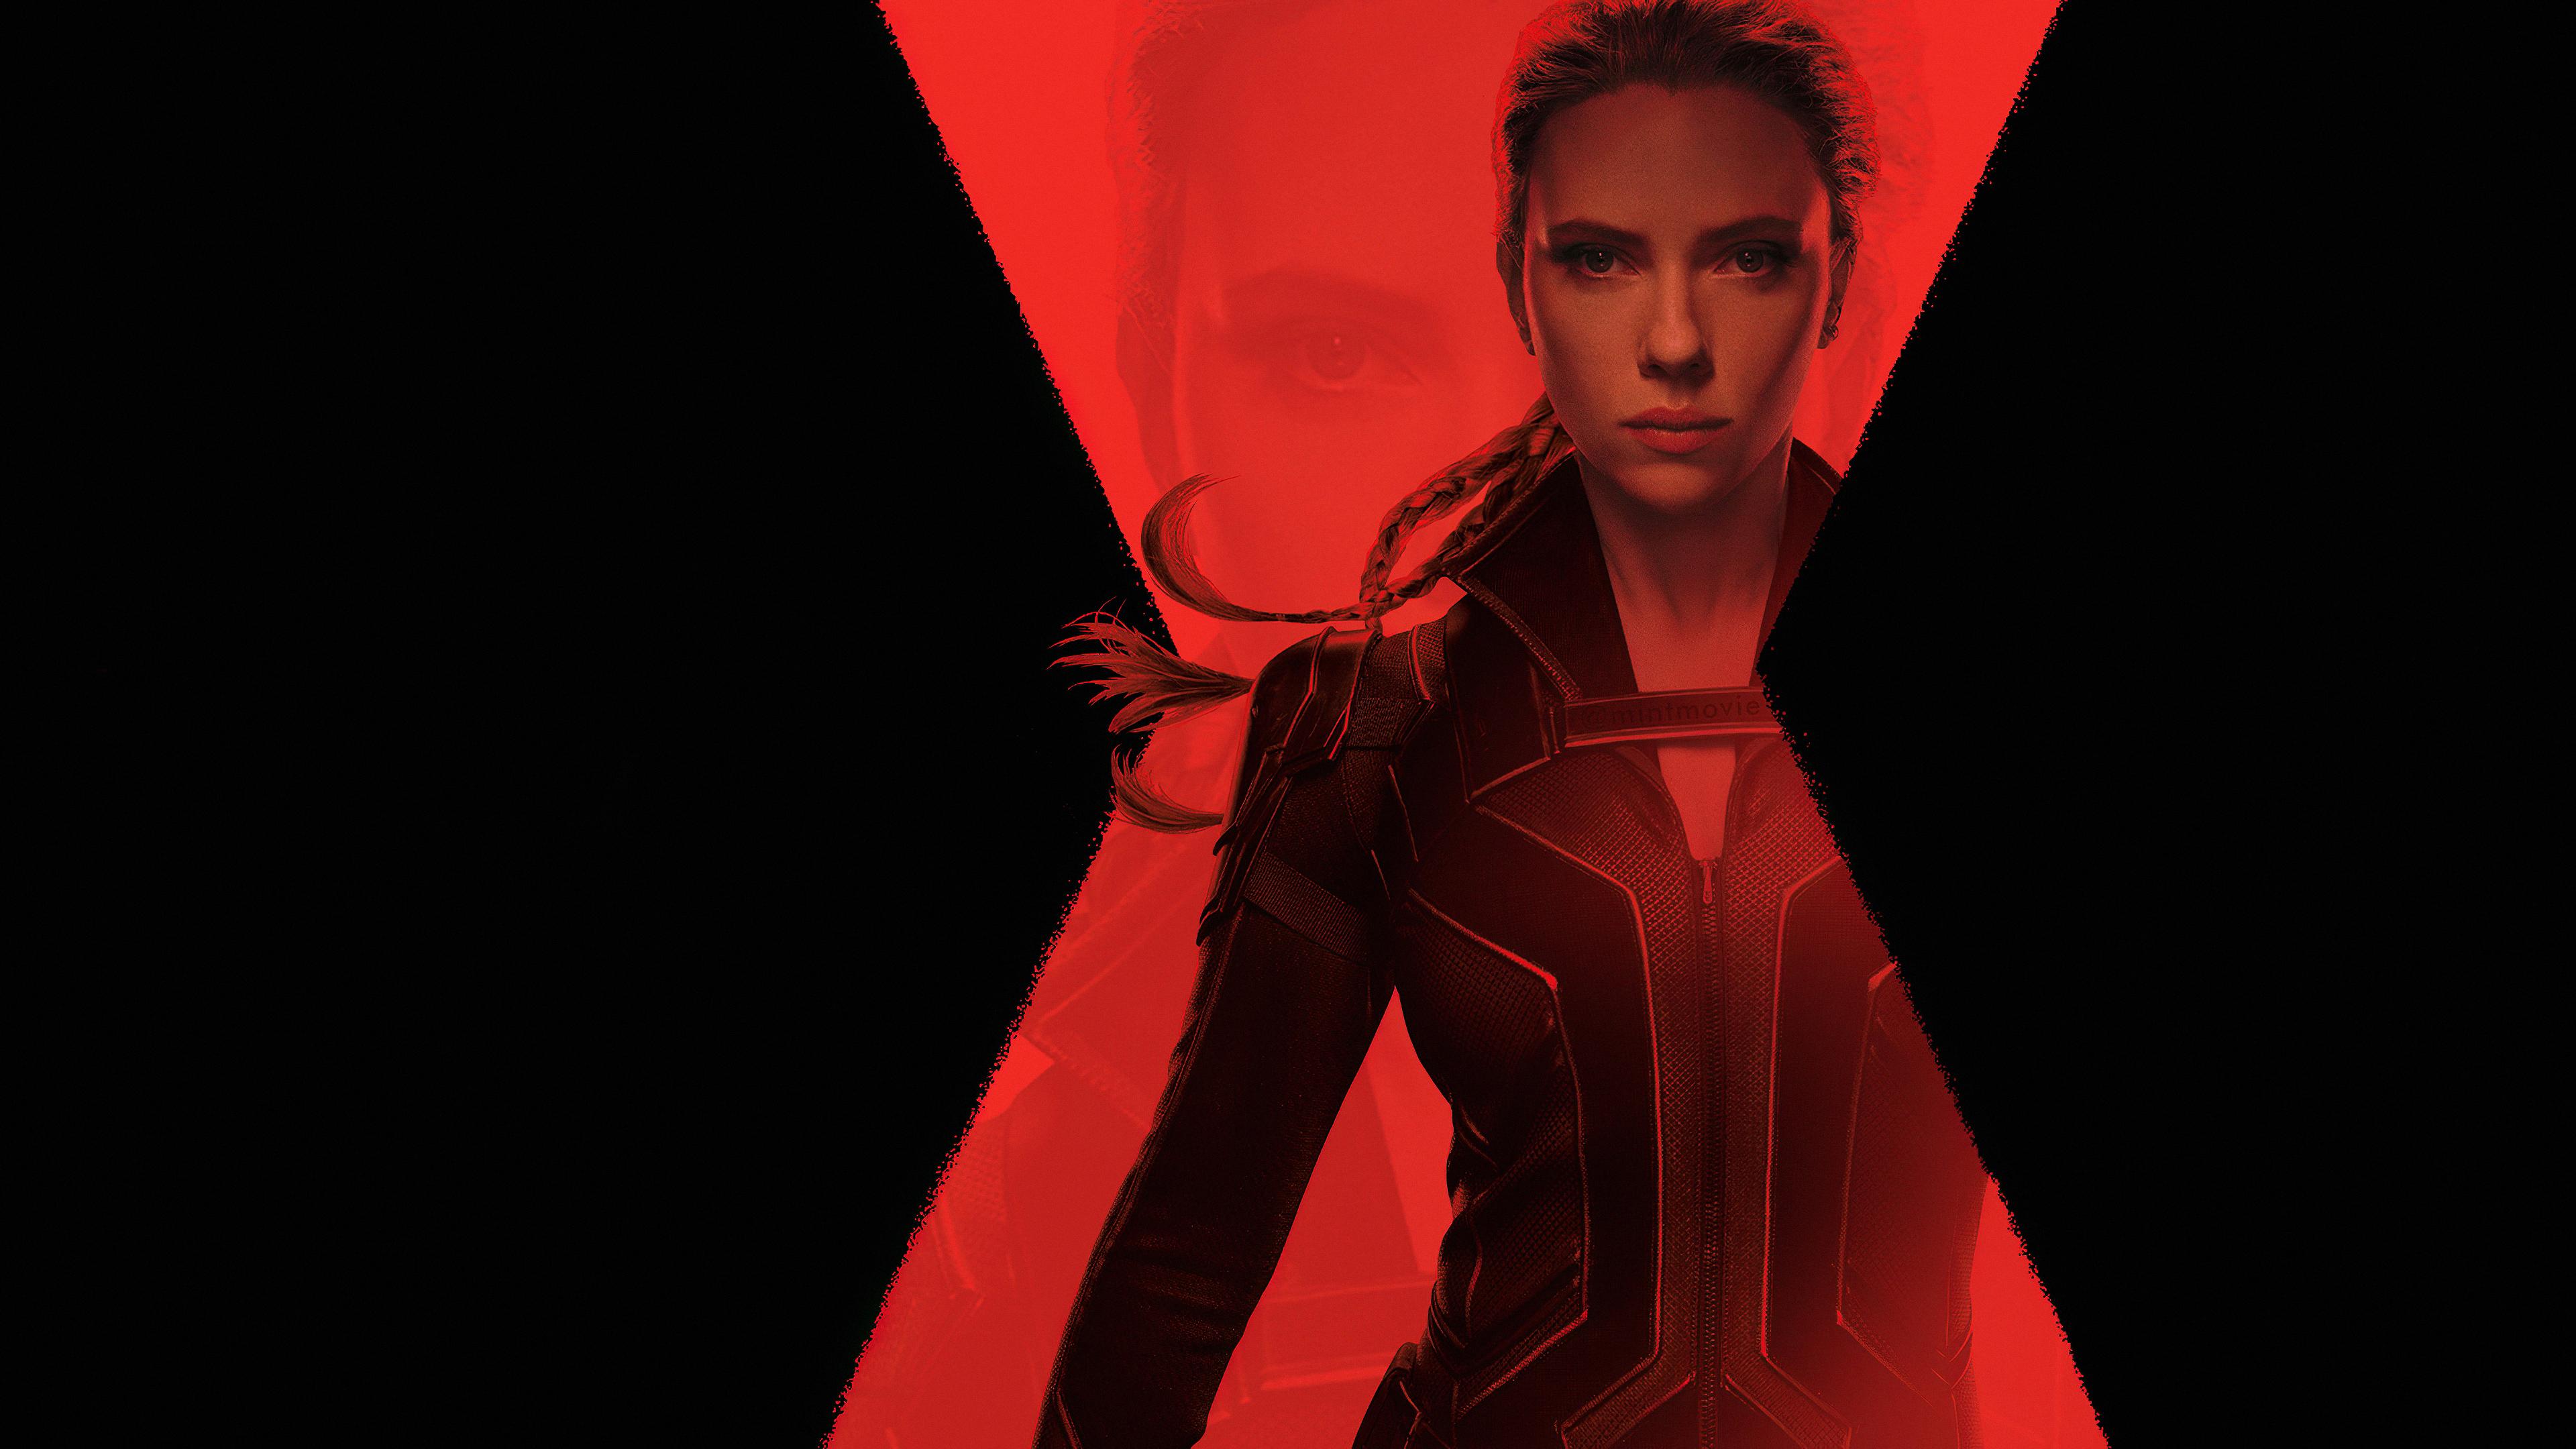 Black Widow 4k 2020, HD Movies, 4k Wallpapers, Images ...